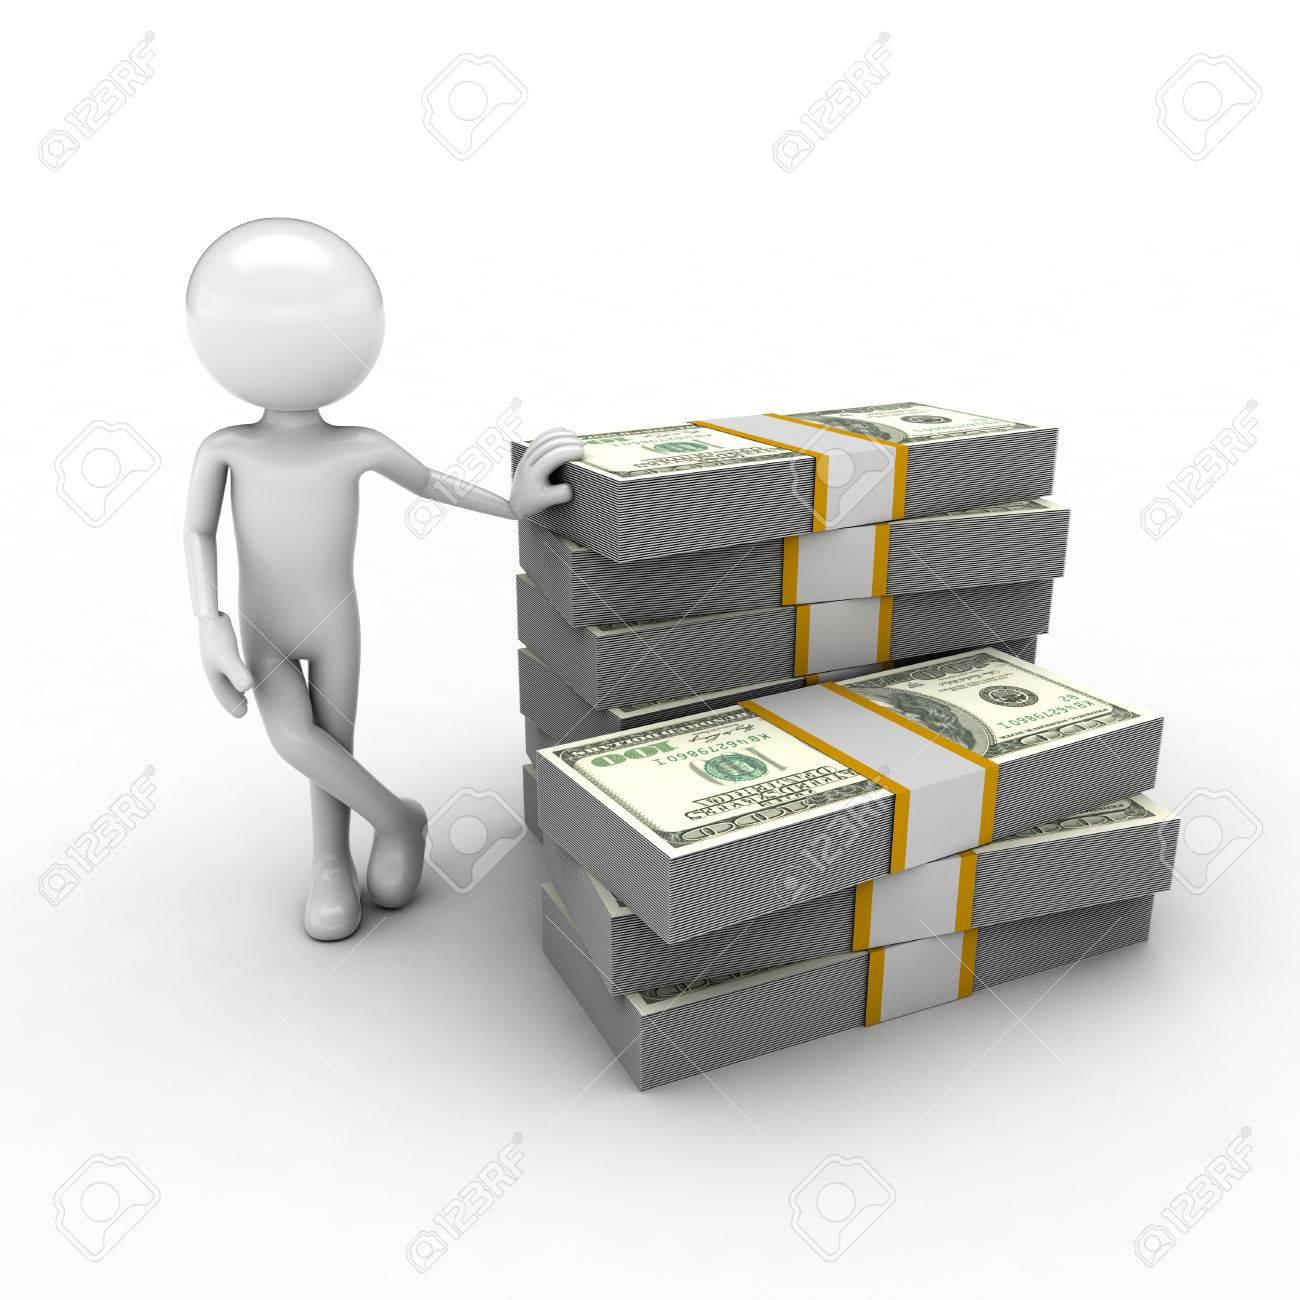 visual describing the economy using monetary and human figures Stock Photo - 57570280